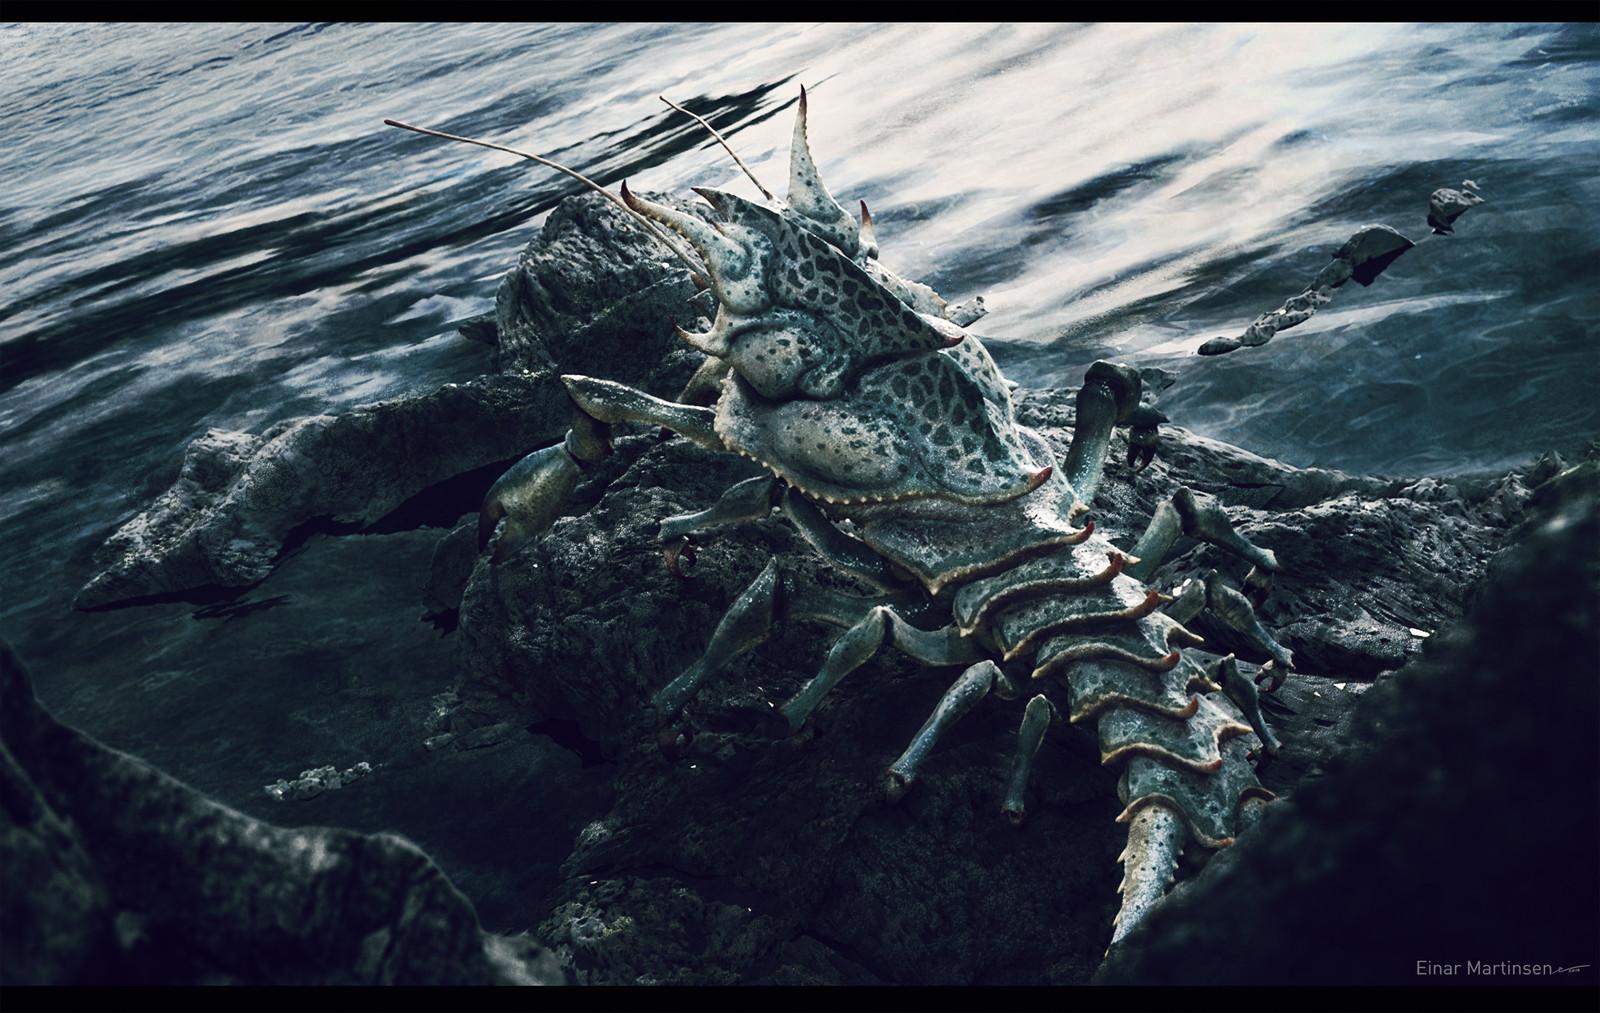 Alien crab concept